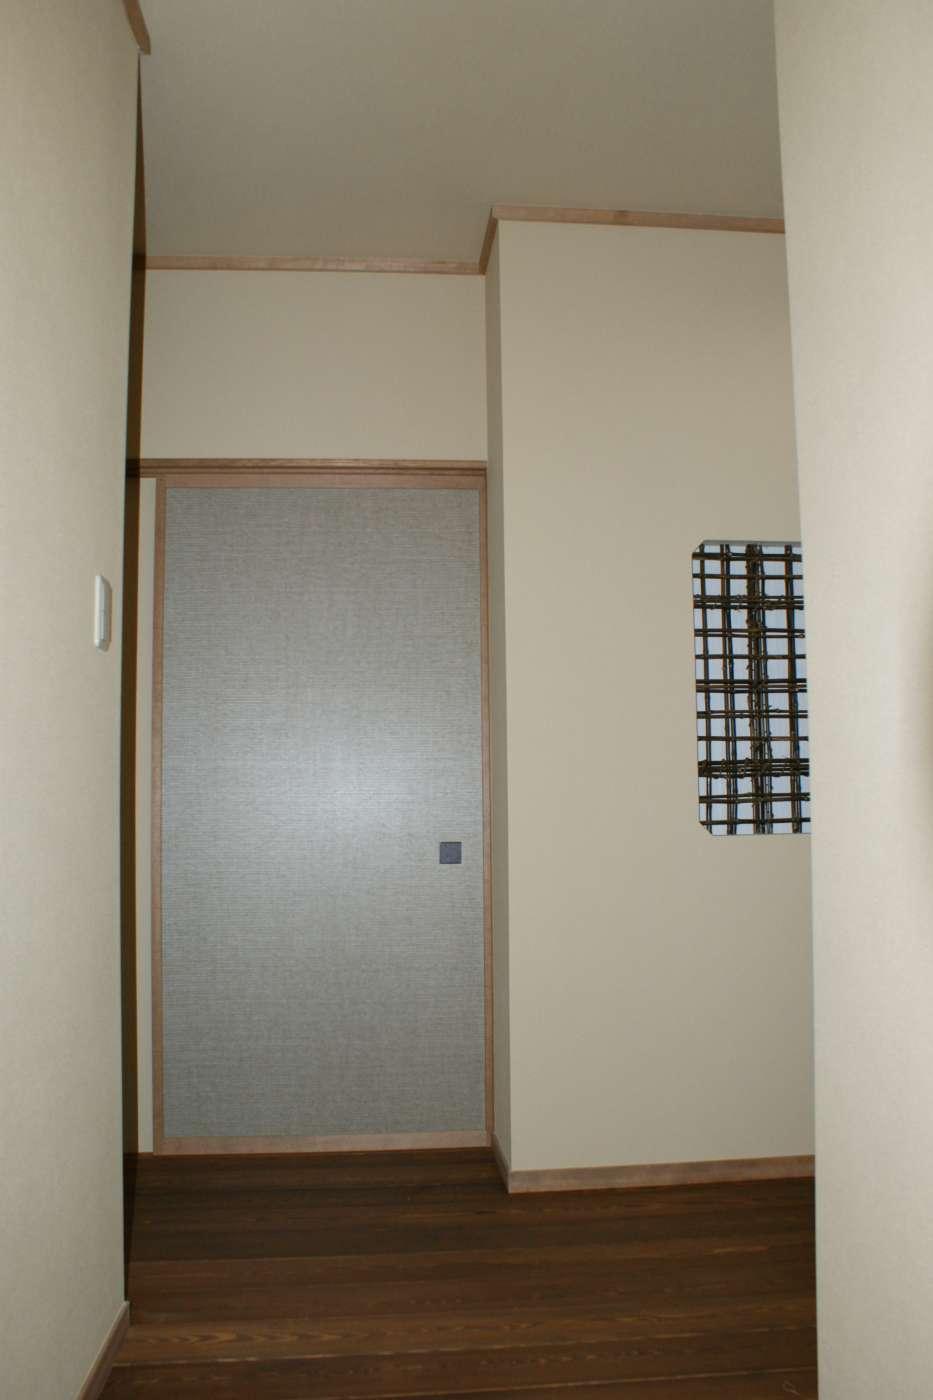 http://sumainomatsuki.com/folder1/DSC01581.JPG